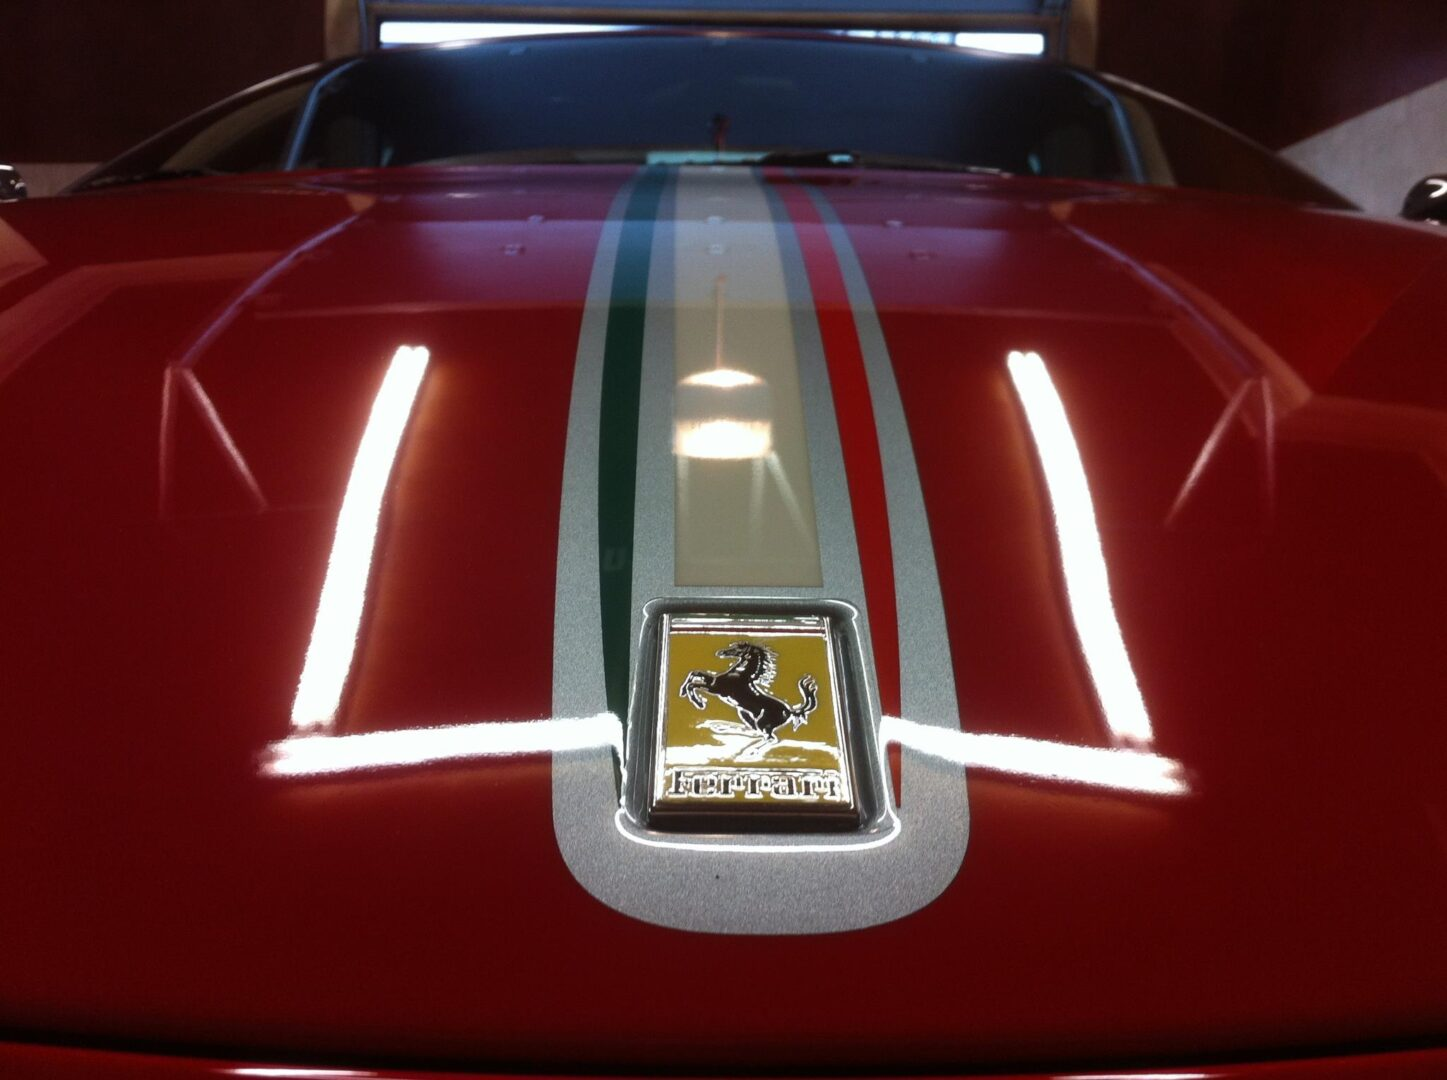 Front hood of a shiny red Ferrari car